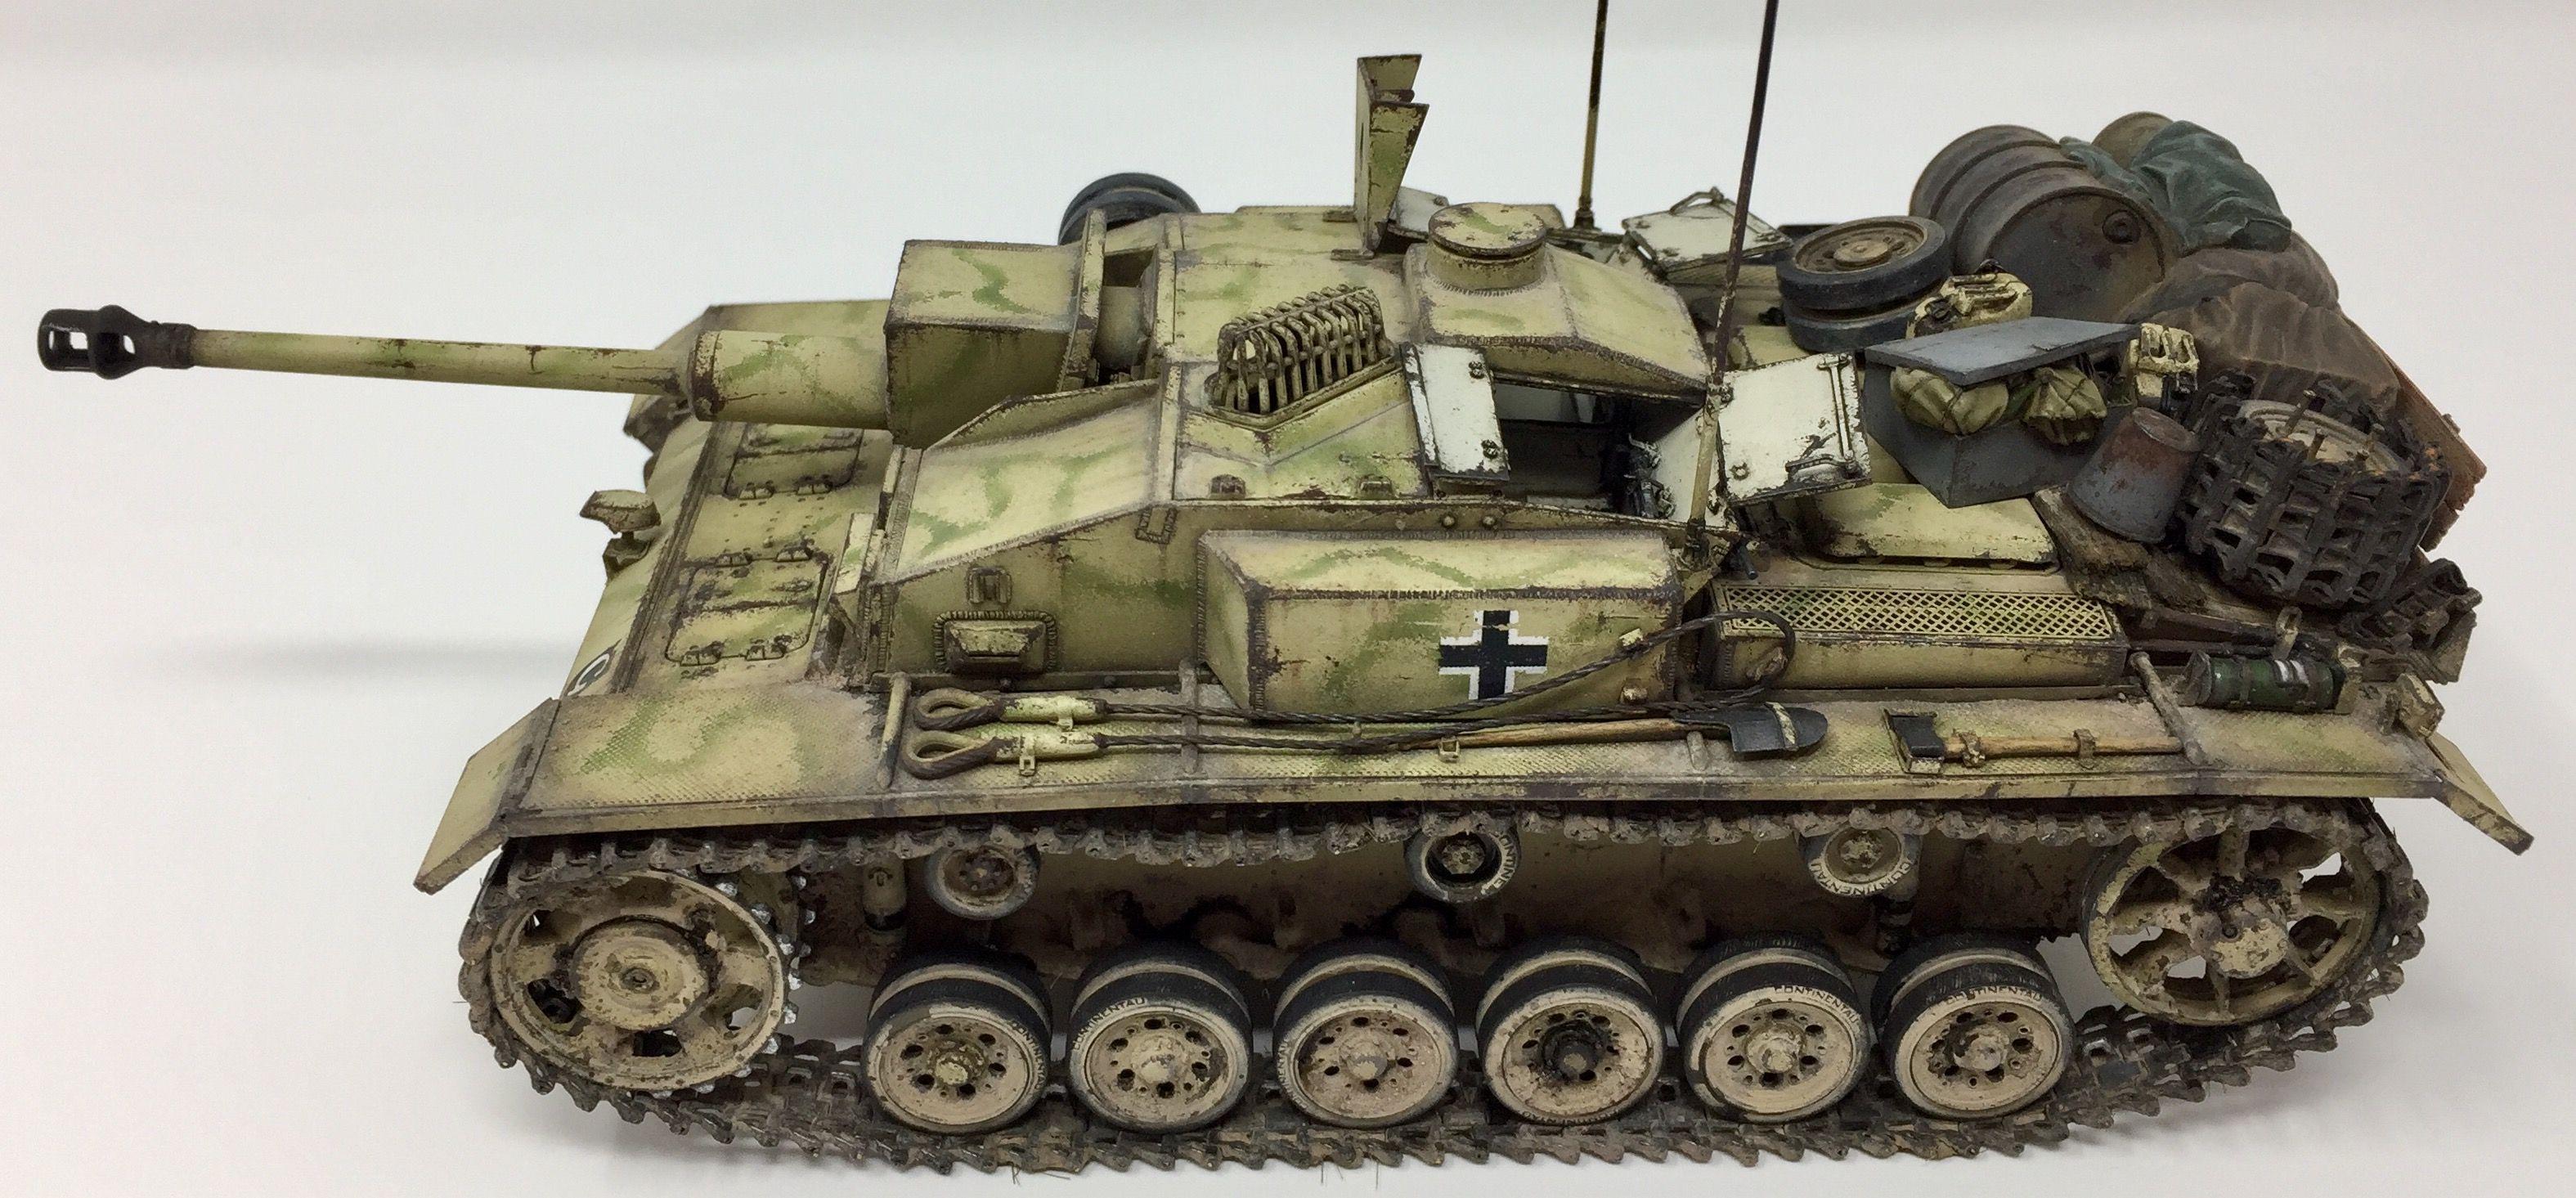 1/35 Scale  #Stug III Ausf F/8 from summer of 1943  Battle